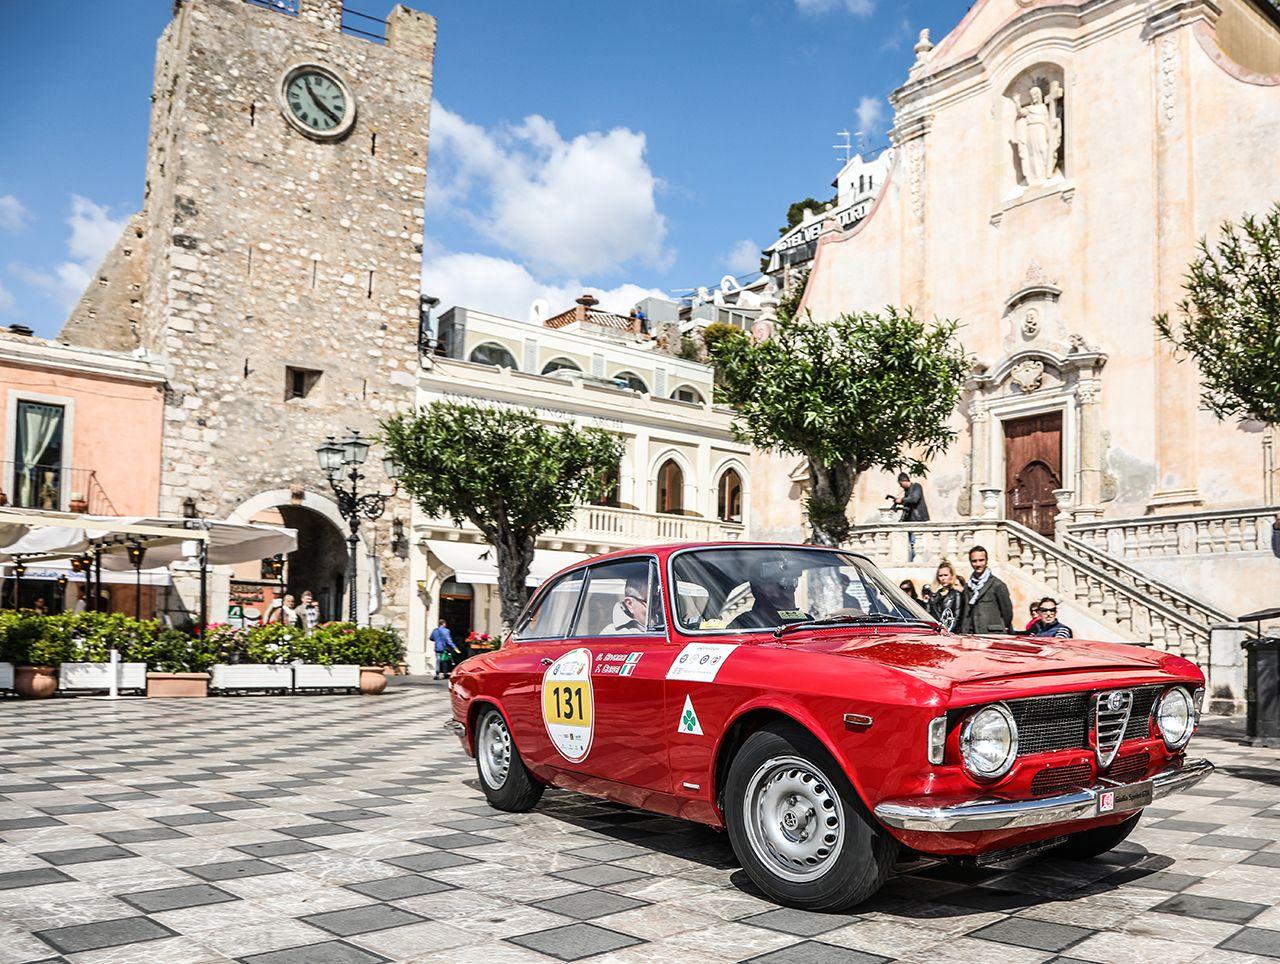 170422 Alfa Romeo On Air 04 Ο πρώτος γύρος στο Targa Florio 2017: από την Taormina στην Cefalù Alfa, alfa romeo, Alfa Romeo Giulia, Alfa Romeo Giulia GTA, Alfa Romeo Giulietta, Alfa Romeo Giulietta SZ, Classic, Targa Florio, videos, αγωνες